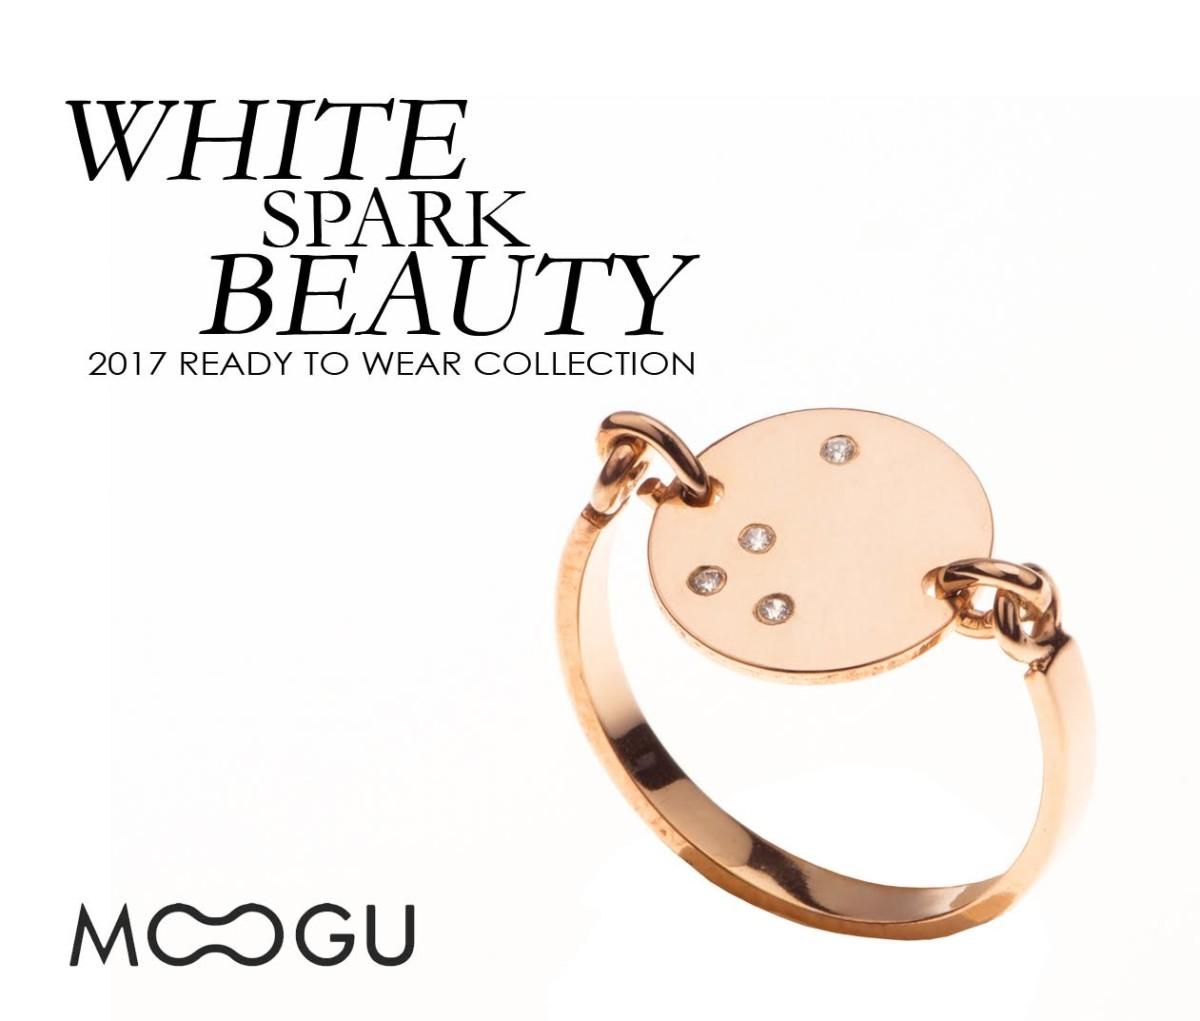 MOOGU prezinta noua colectie ready-to-wear 2017: White Spark Beauty